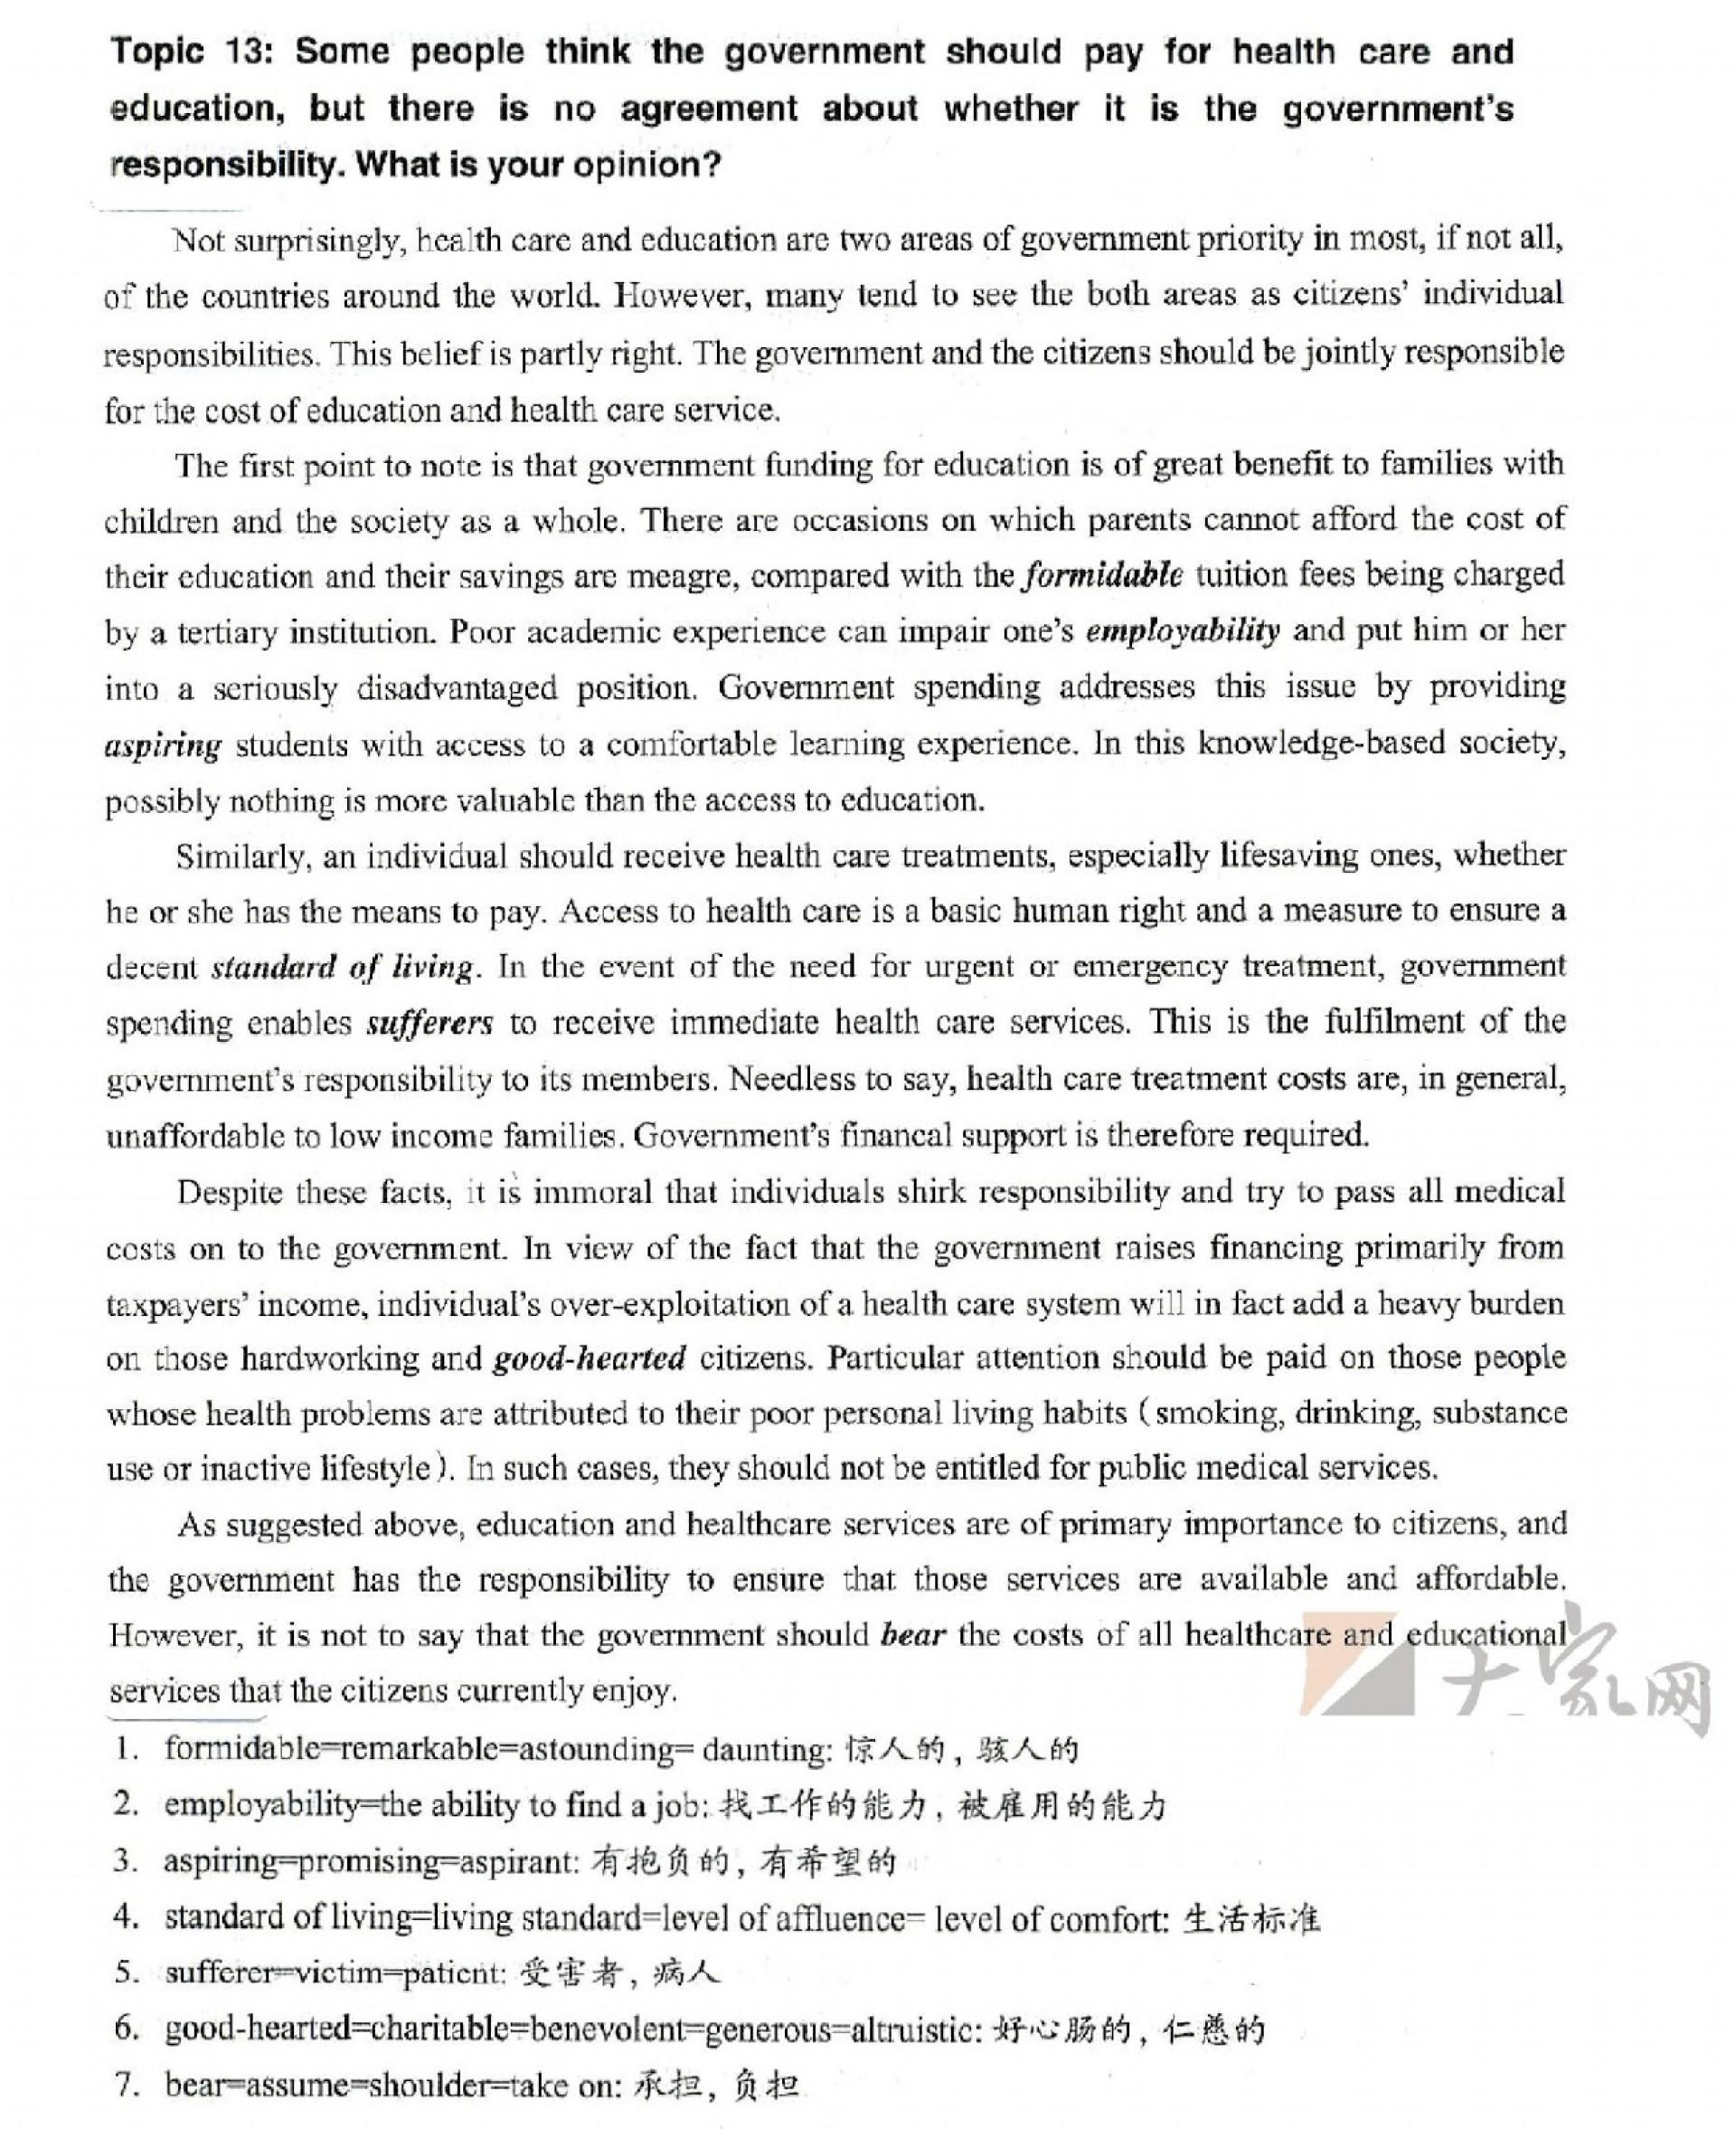 008 Writingtask2rezagholami0013 Ielts Essay Writing General Training Unique Topics For Pdf Samples 1920